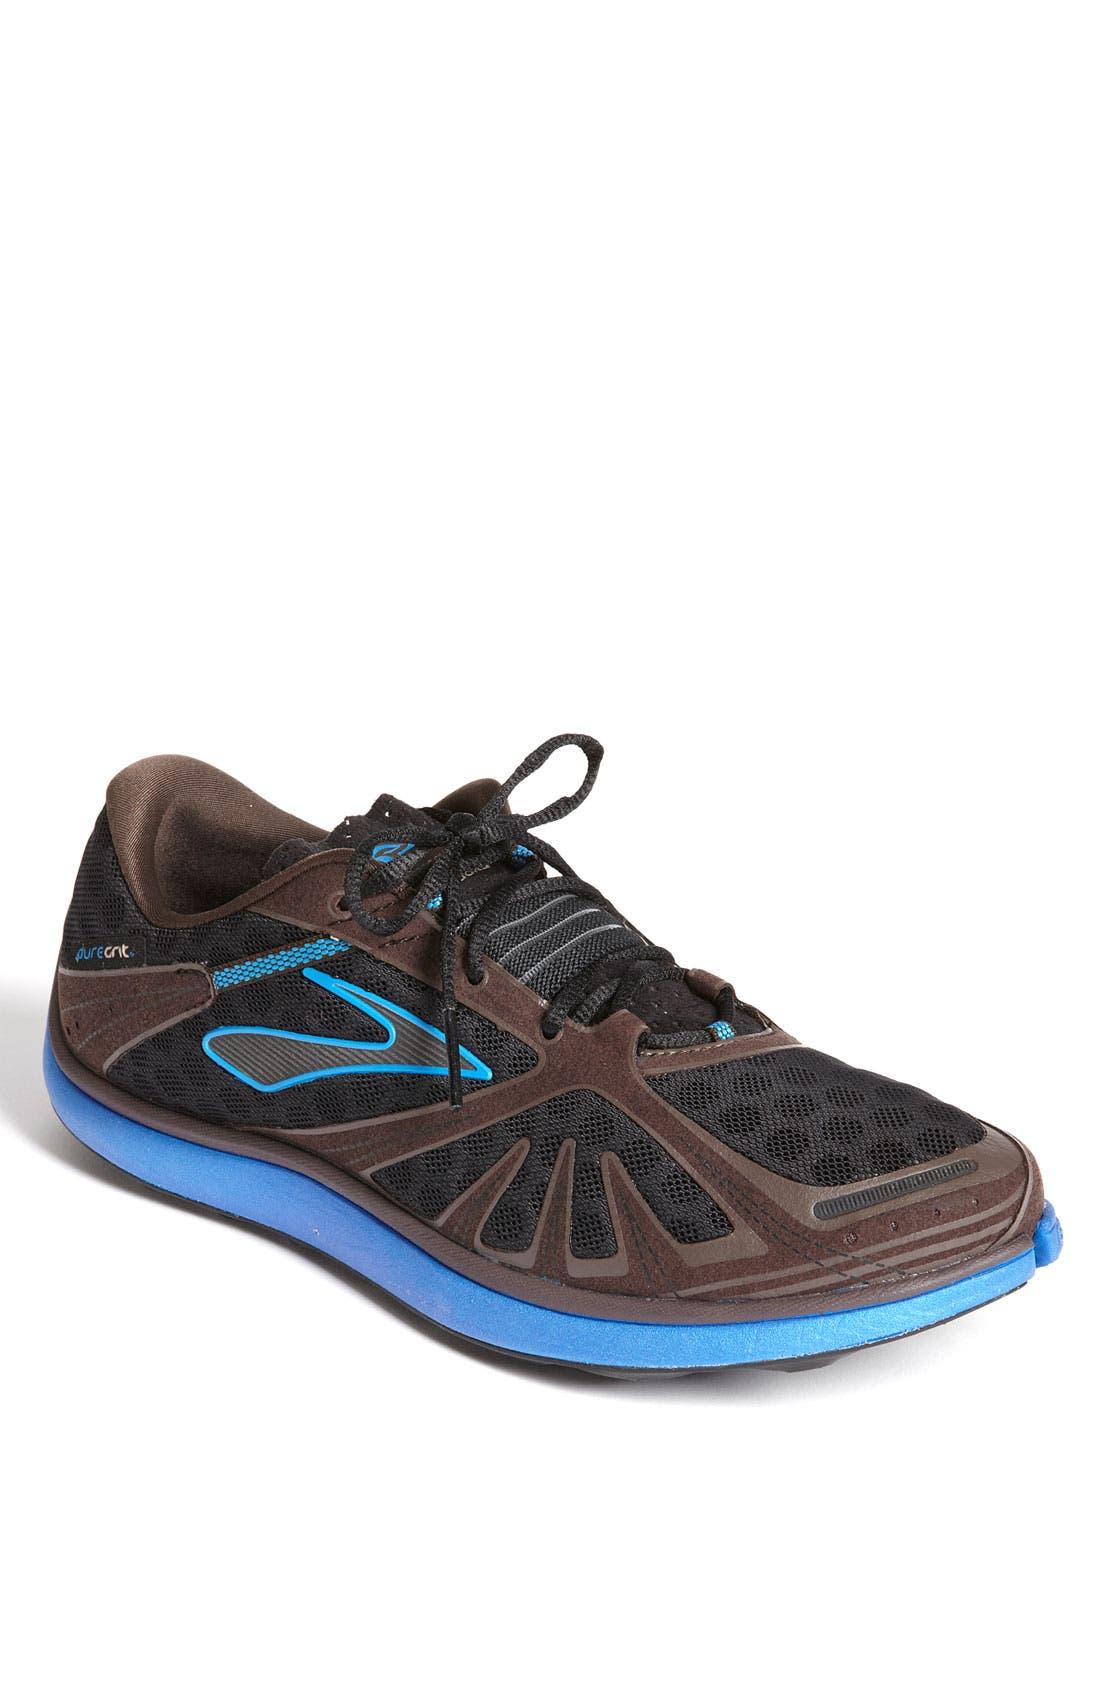 Alternate Image 1 Selected - Brooks 'Pure Grit' Running Shoe (Men)